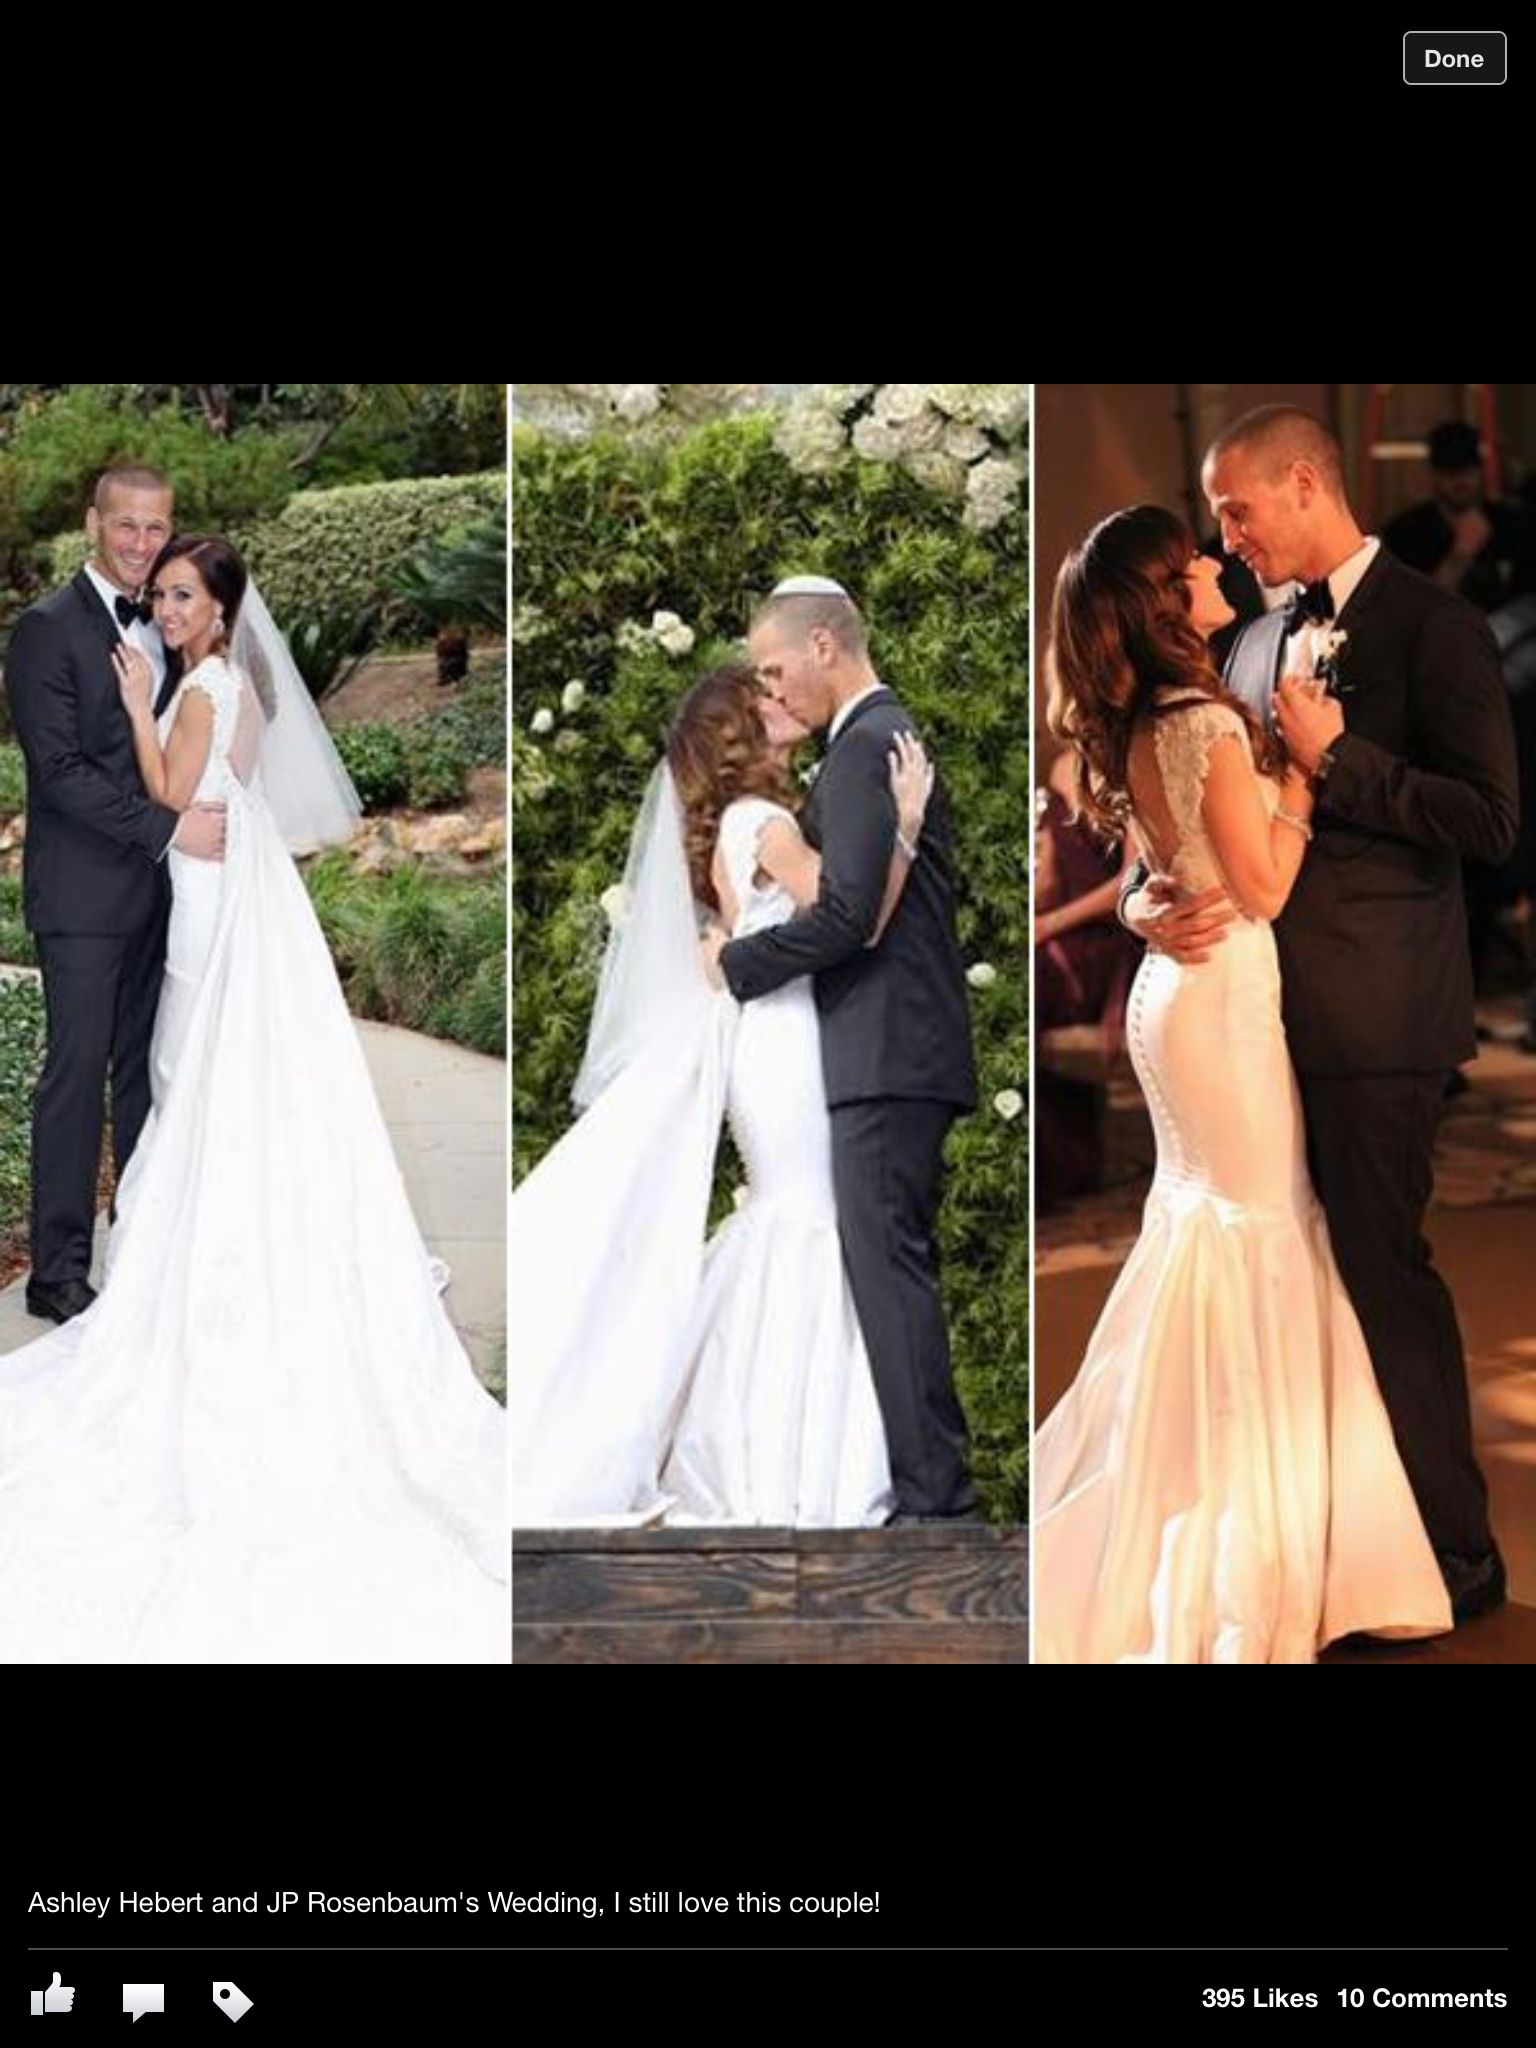 Khloe kardashian wedding dress  Pin by Natascha Schwartz on Weddings  Pinterest  Weddings